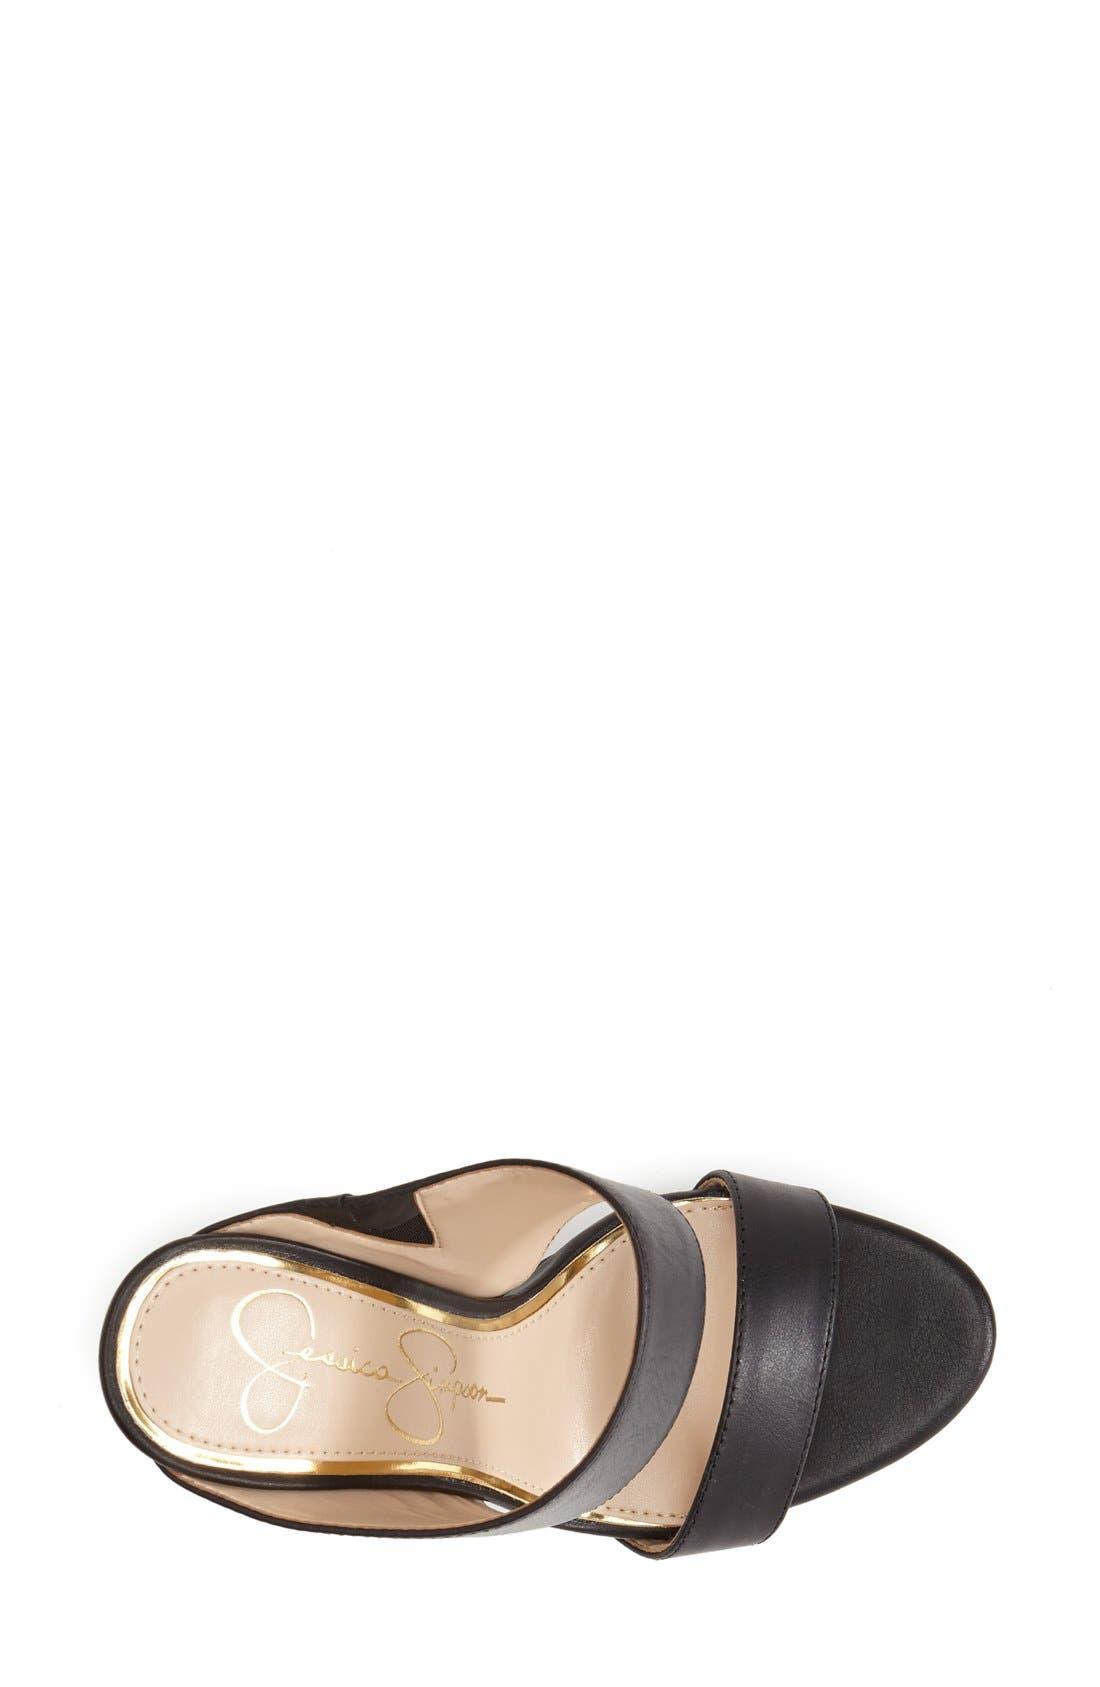 JESSICA SIMPSON,                             'Romy' Leather Platform Mule,                             Alternate thumbnail 4, color,                             001